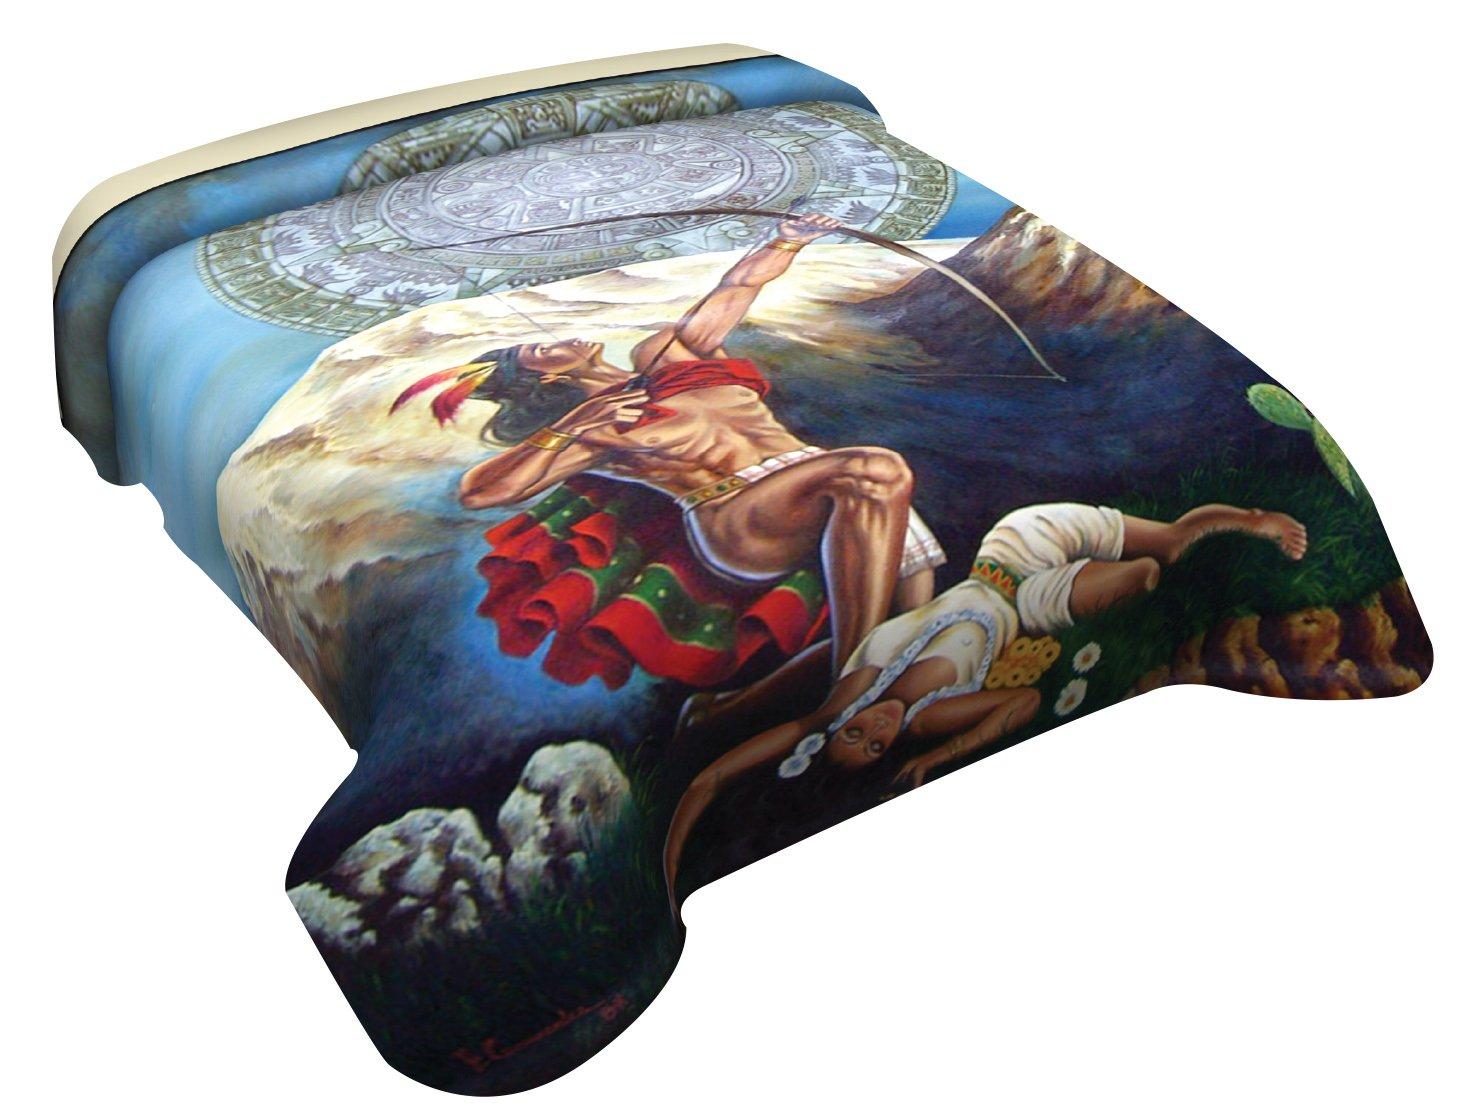 "Premium 100% Polyester Bed Blankets (Choose Size & Design) (71"" W x 87"" H Full Size, Aztec Calendar)"